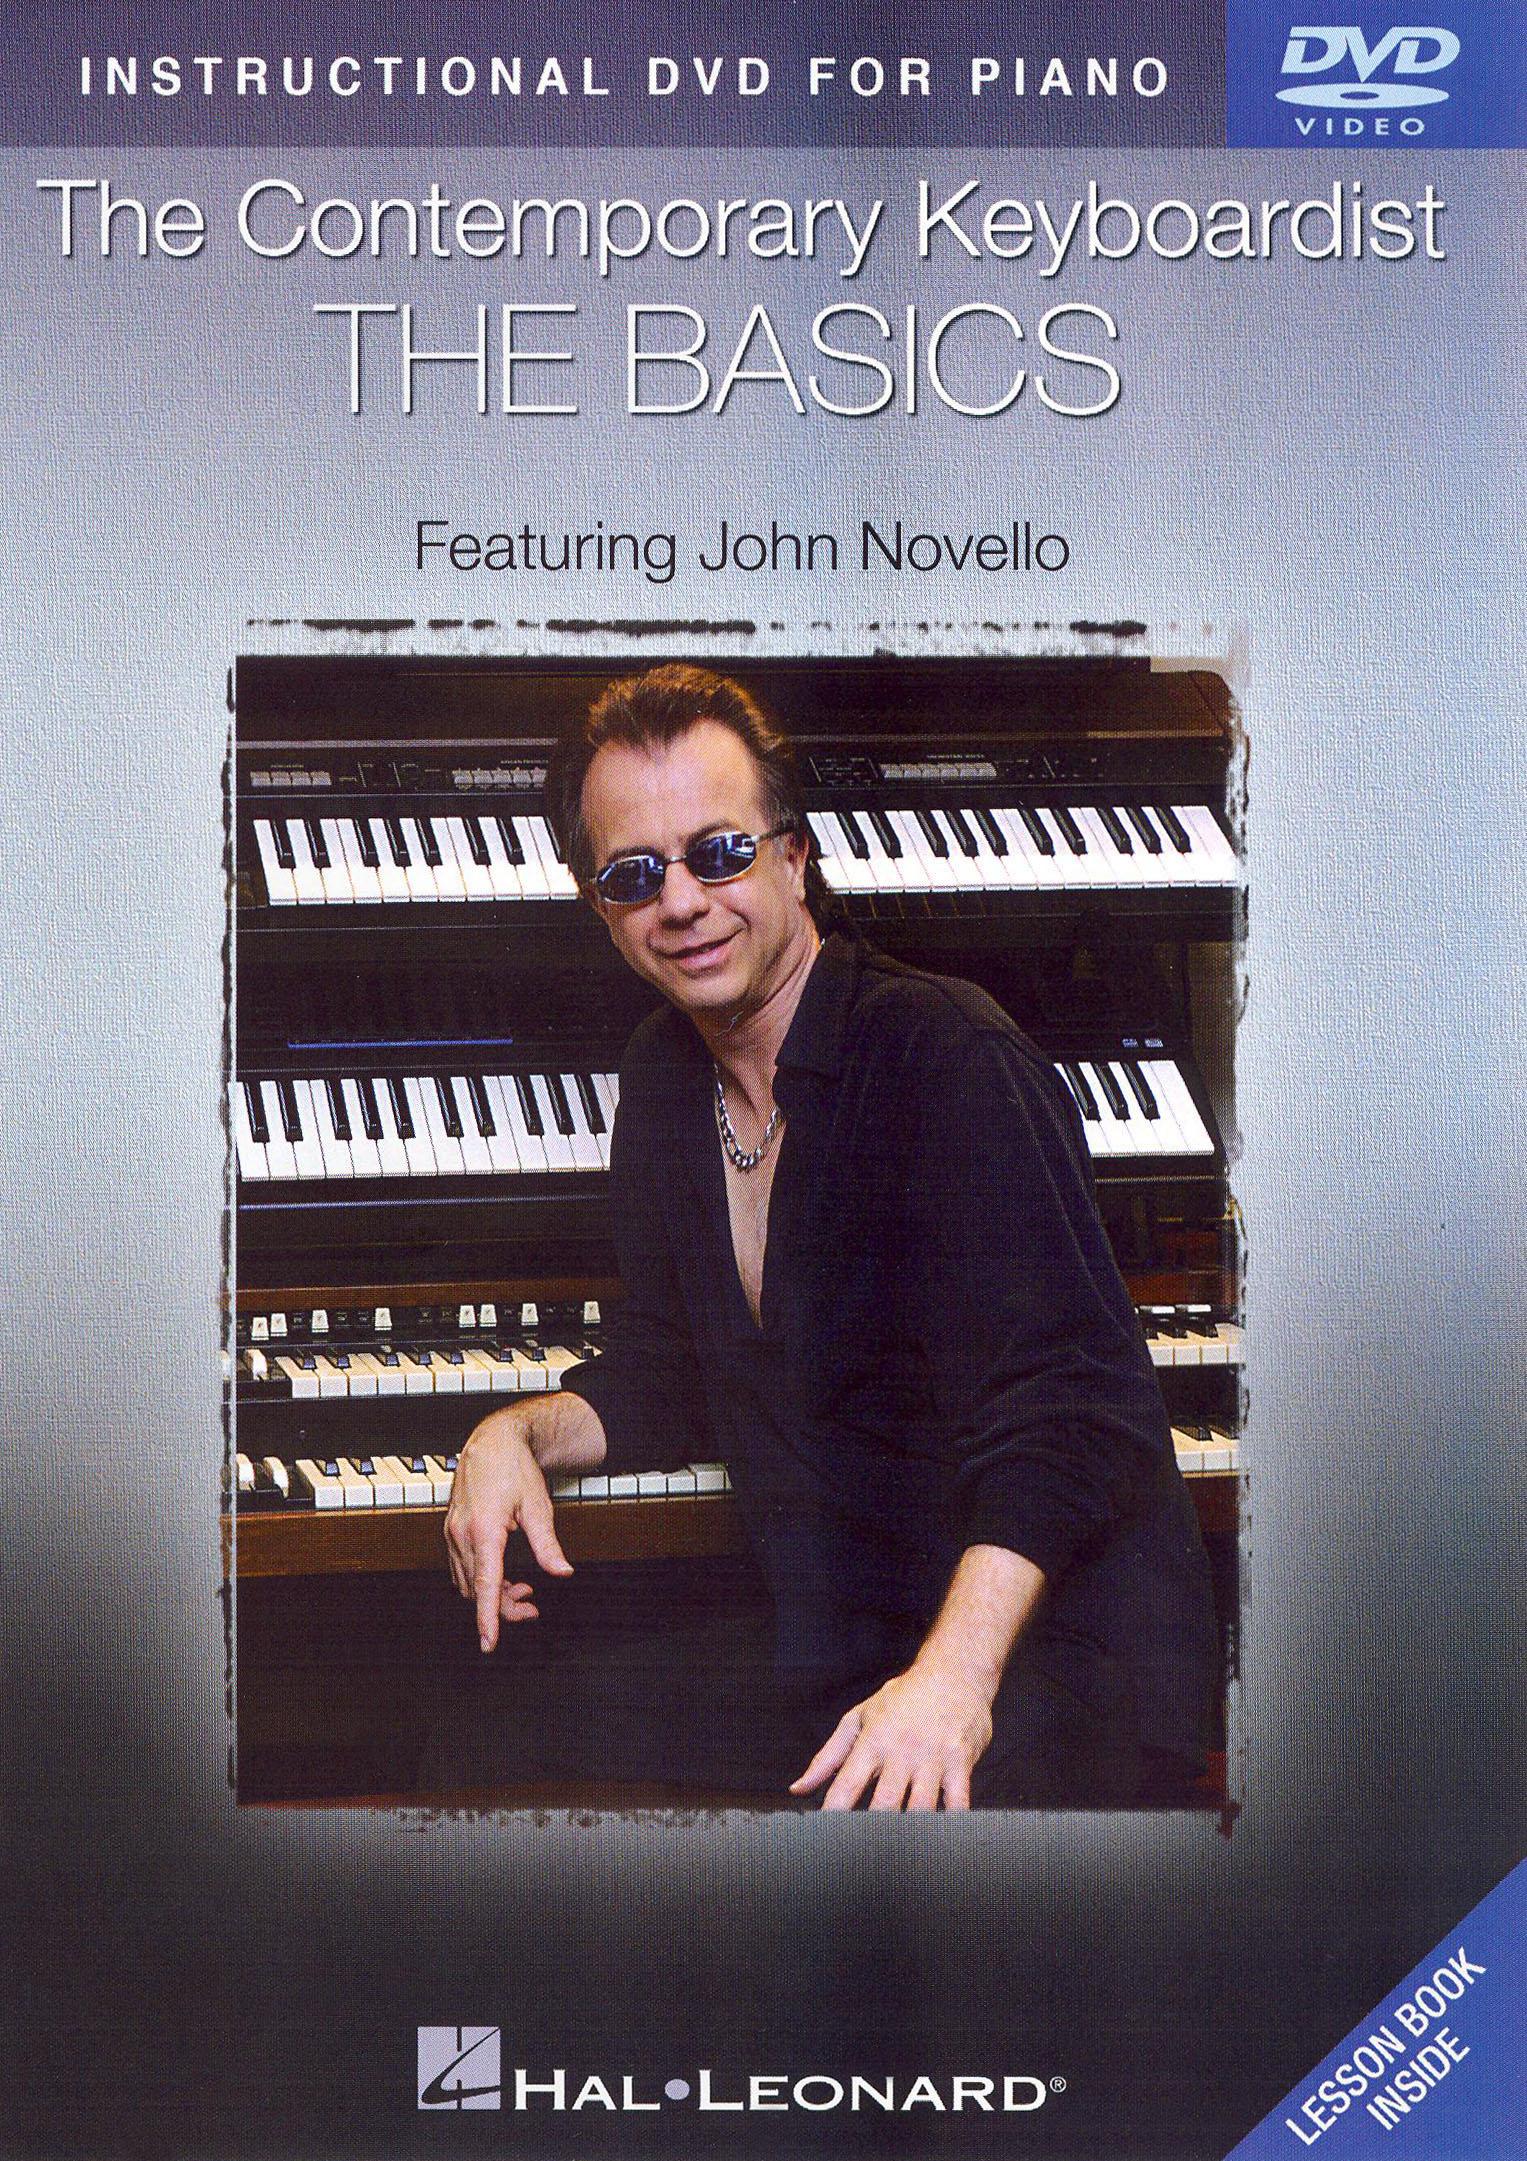 John Novello: The Contemporary Keyboardist